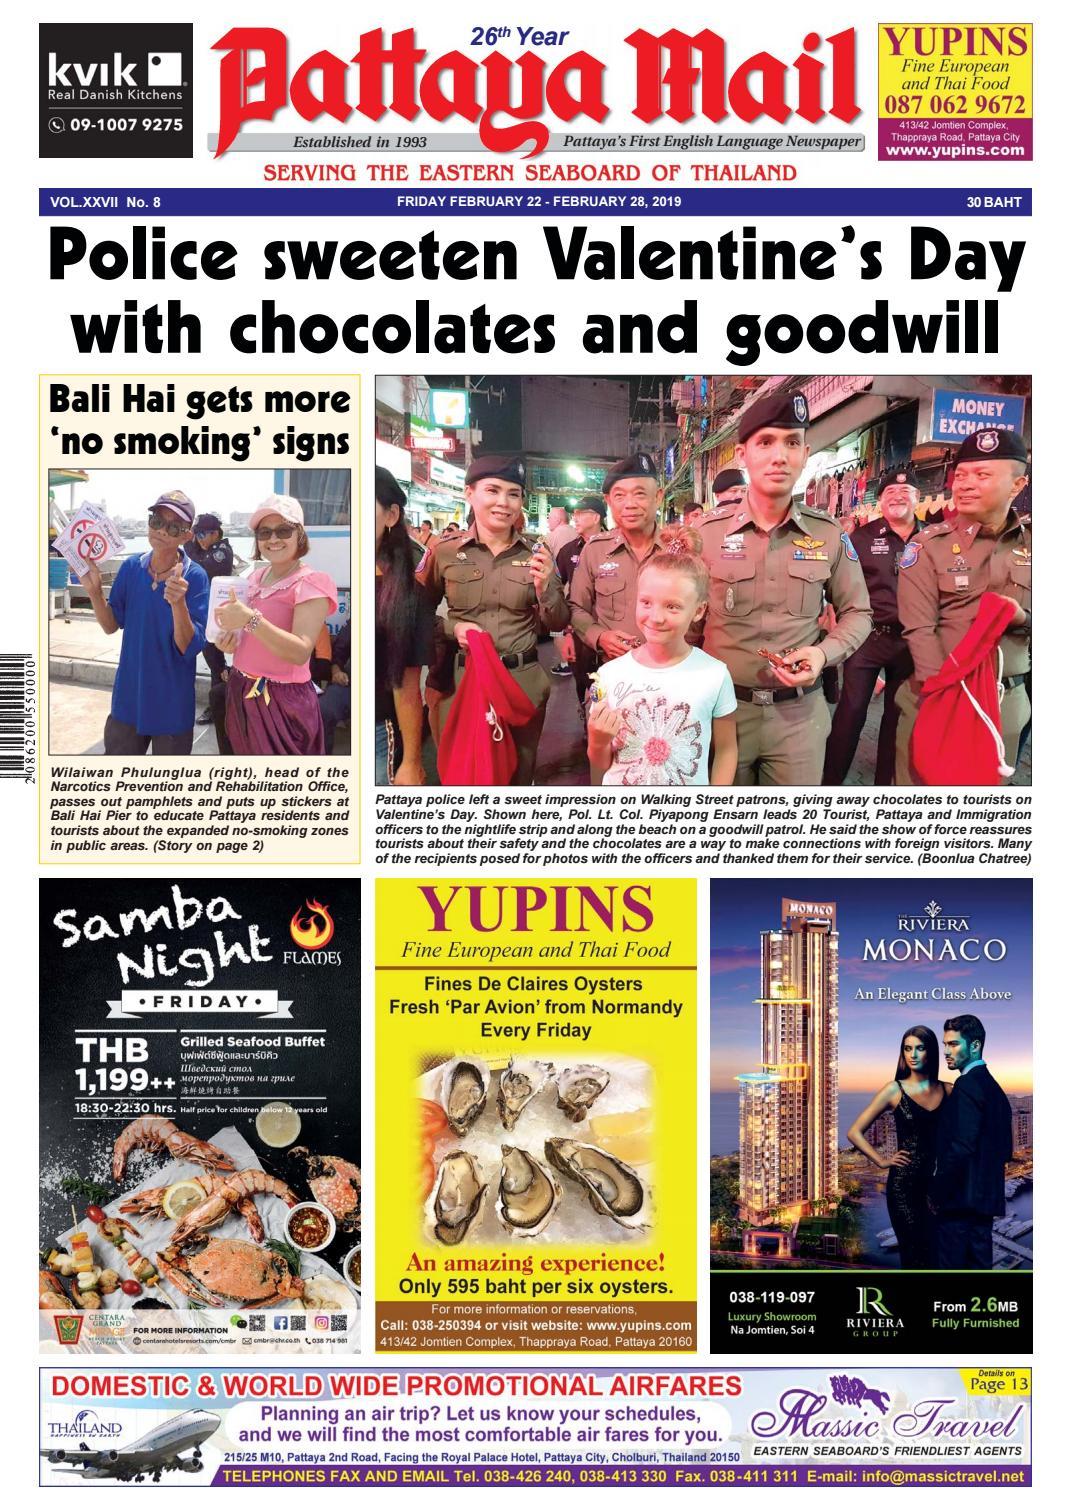 Alexa Ridel Porn Age pattaya mail - friday february 22 - february 28, 2019 (vol